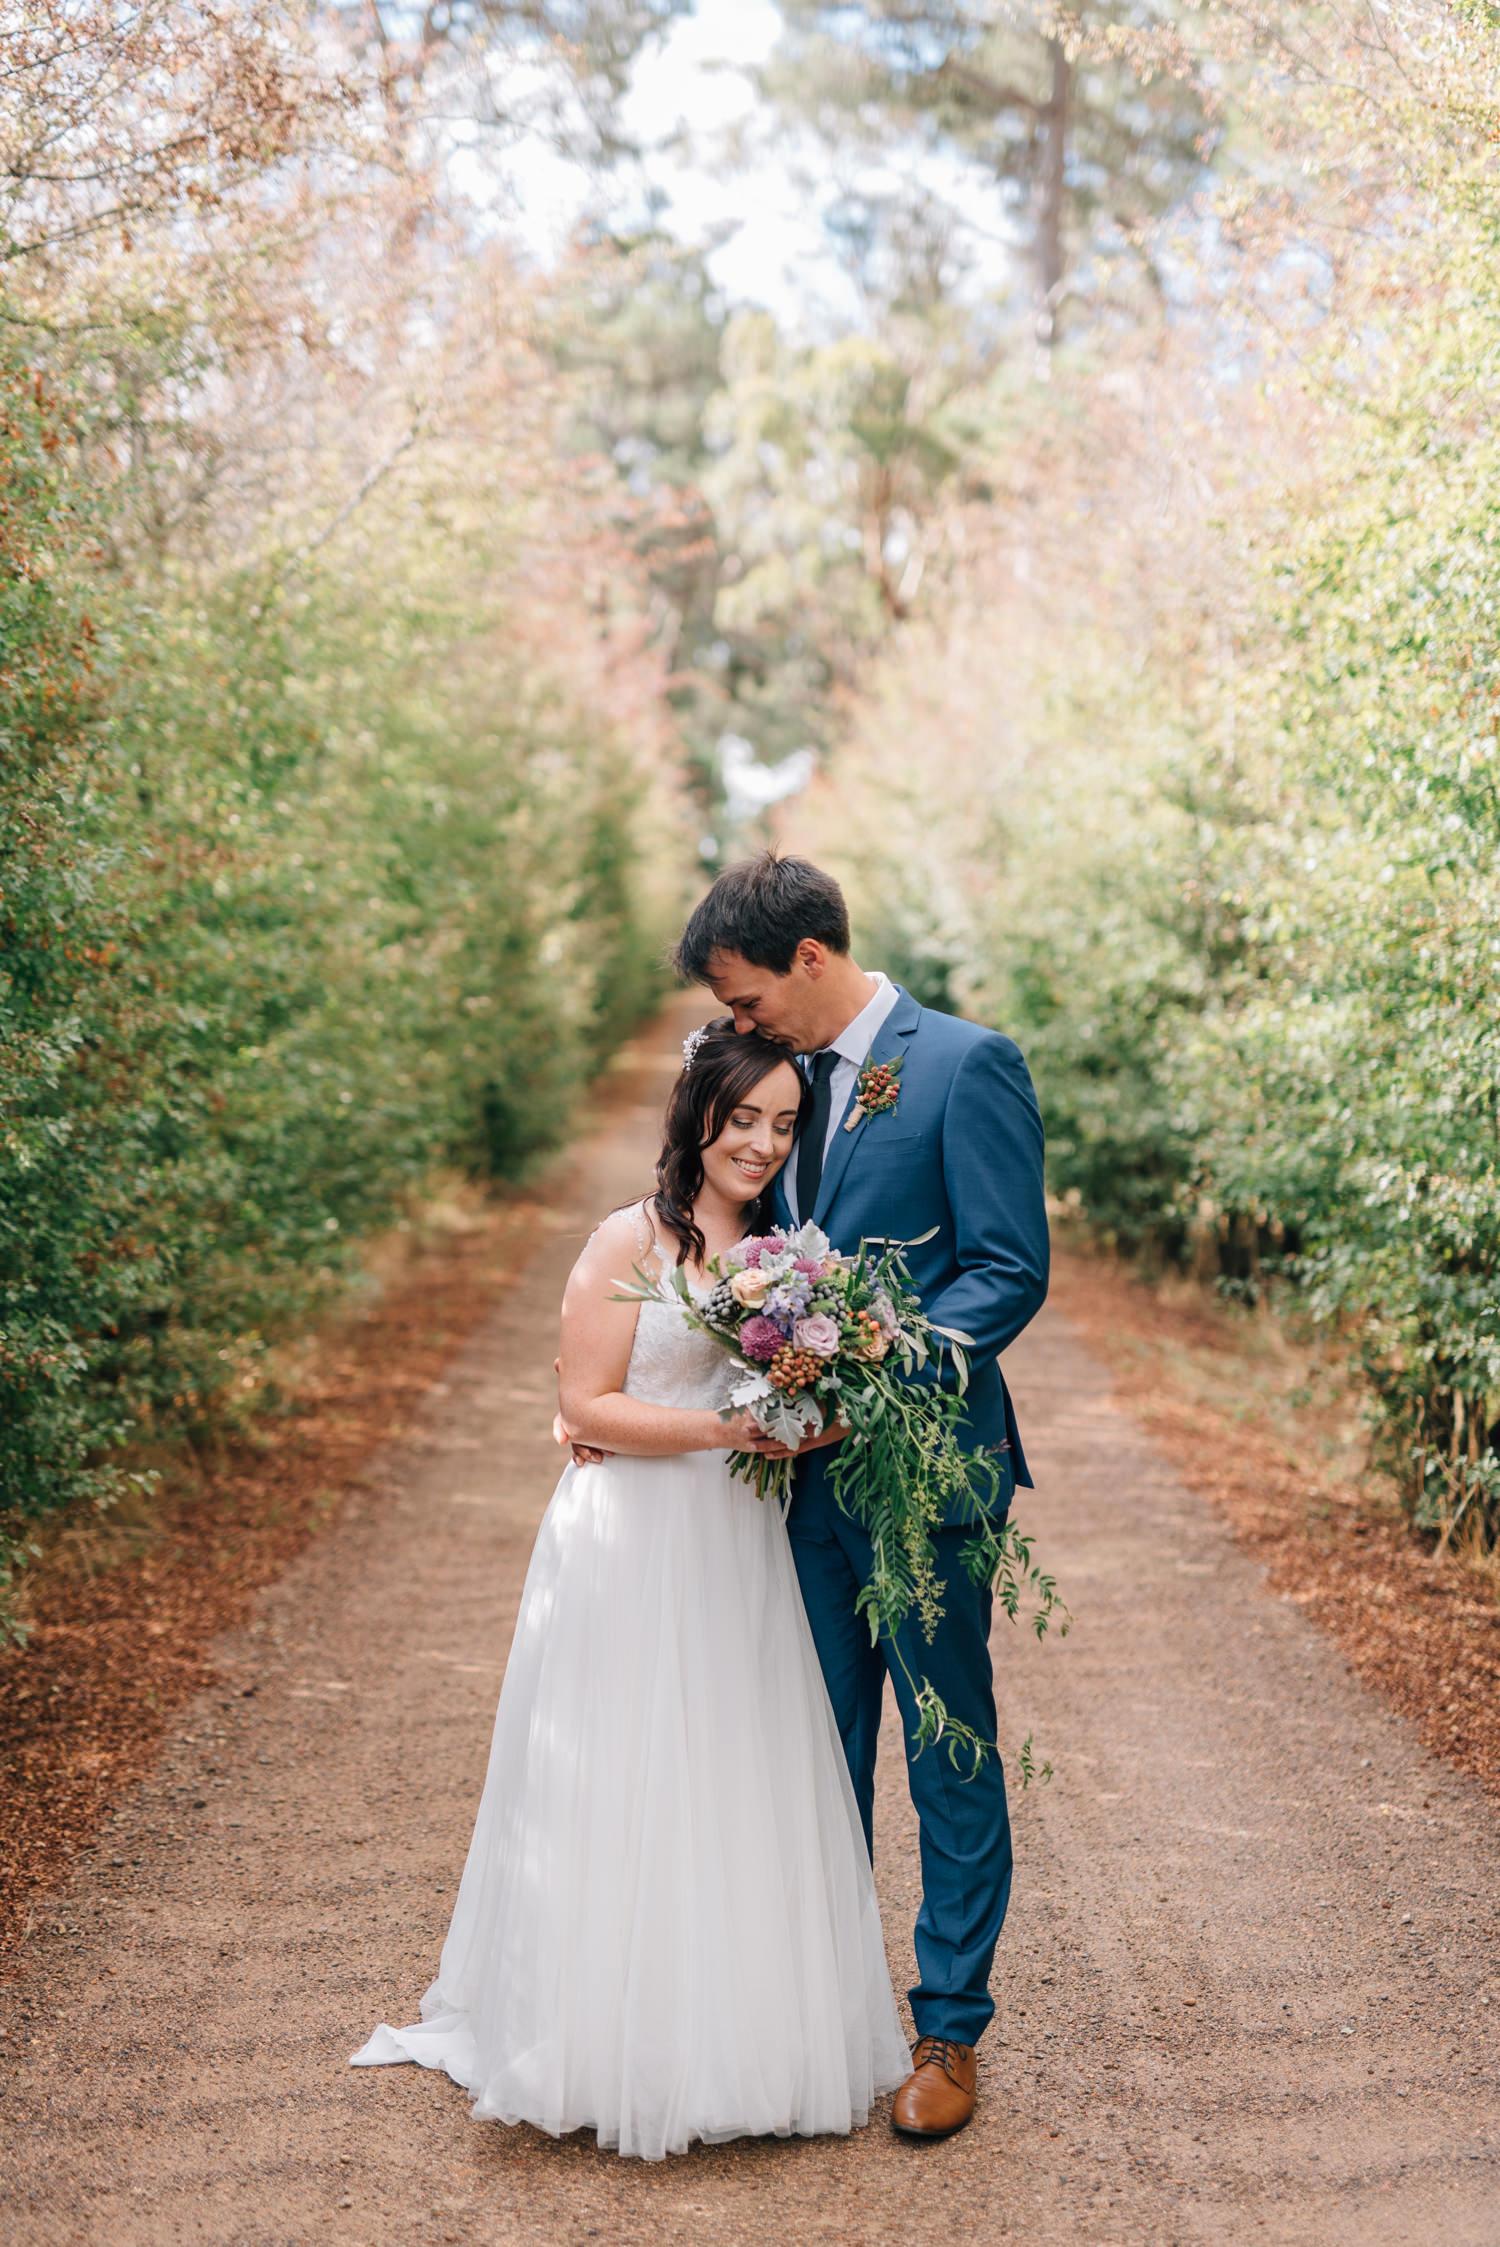 Quamby-Wedding-Photographer-103.jpg